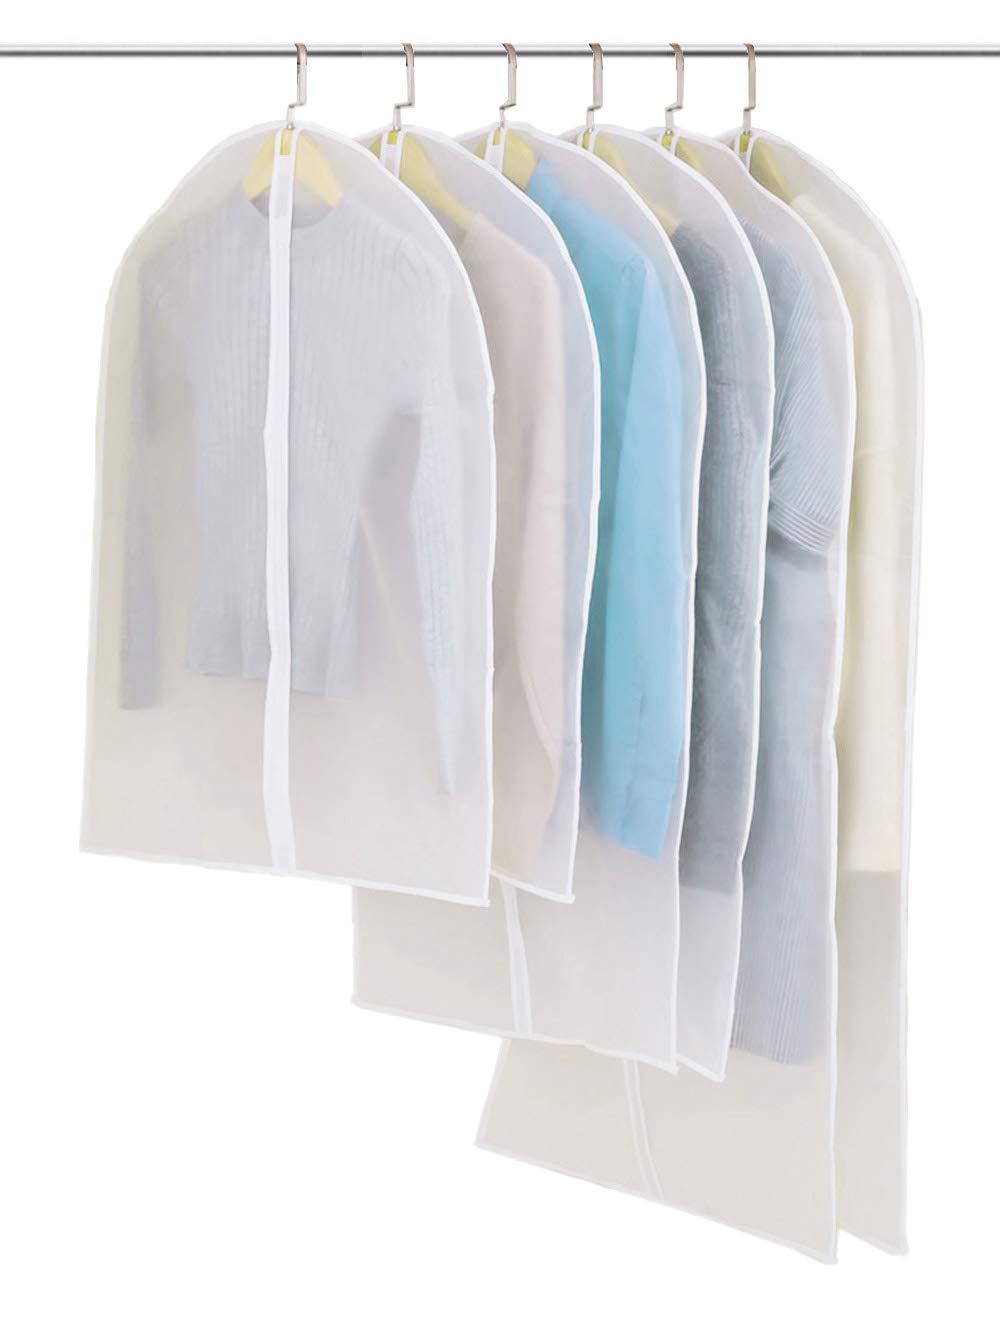 Savant Decor PEVA Garment Bags Suit Cover Pack of 6 Moth Proof with Full Zipper for Storage Closet and Travel, Suit Carriers, Dresses, Fur coats (32''x 2PCS, 40''x2PCS, 47''x2PCS)